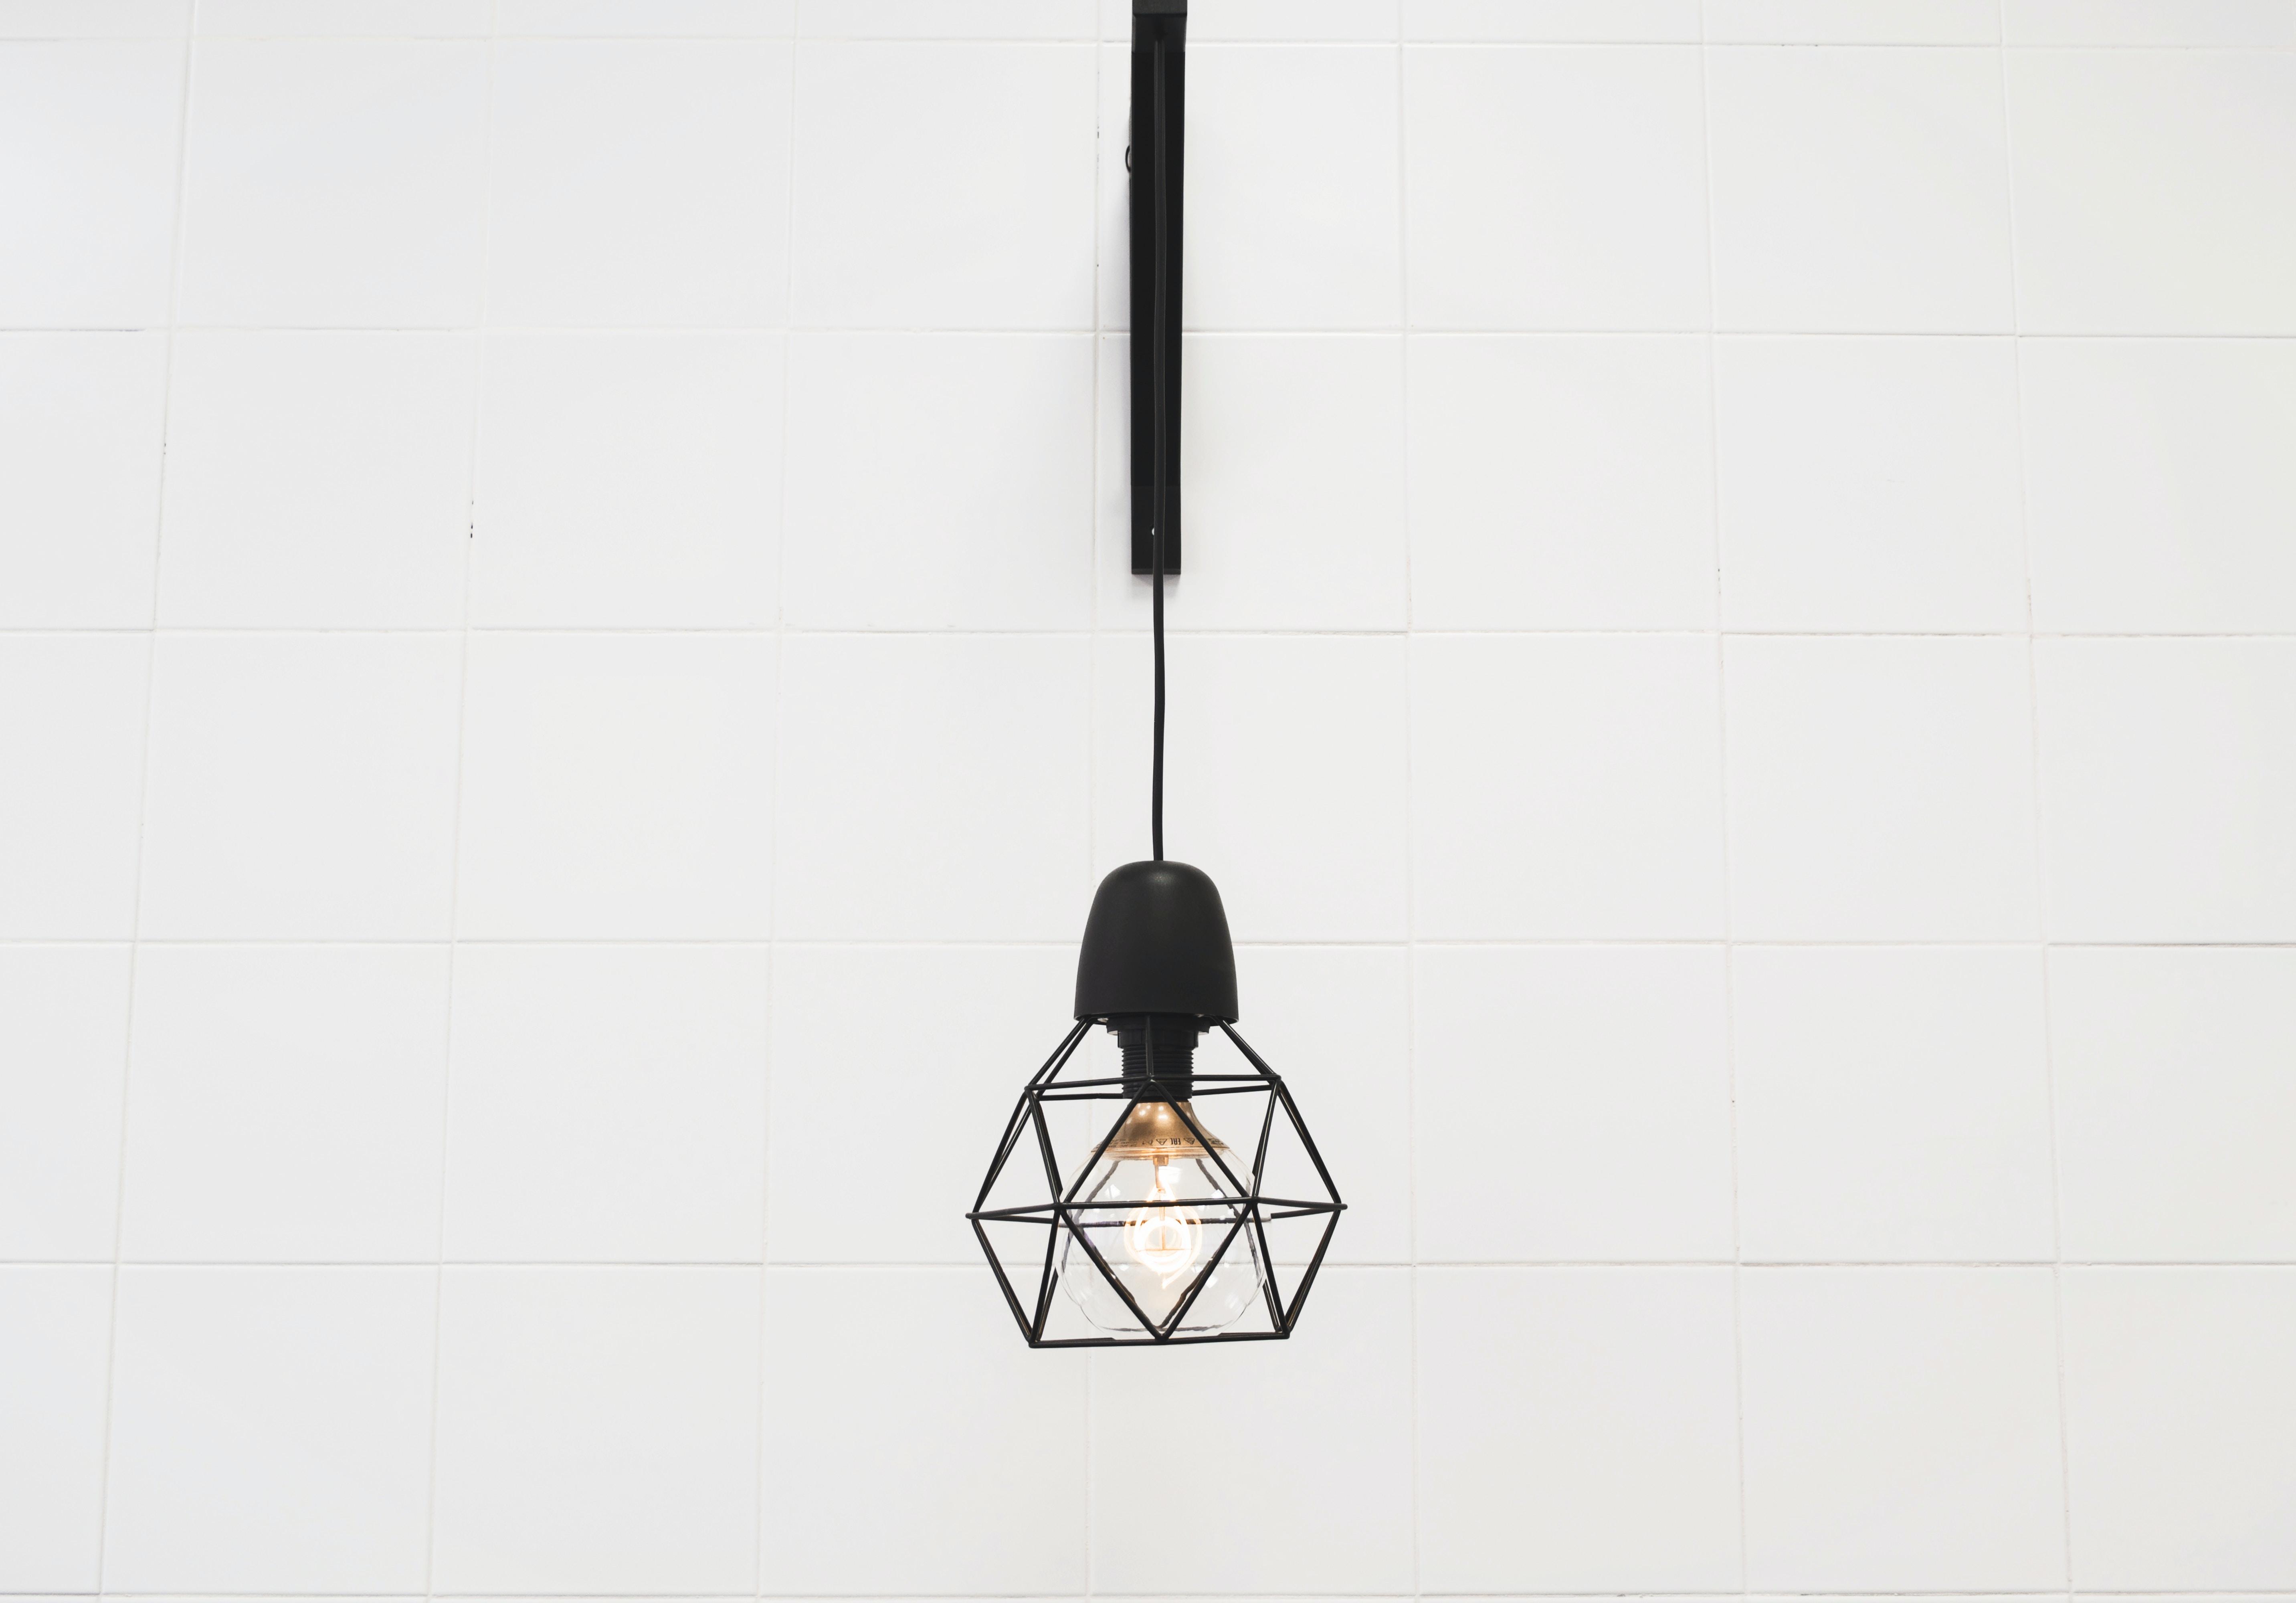 Single geometric lantern with light bulb hanging on a white wall